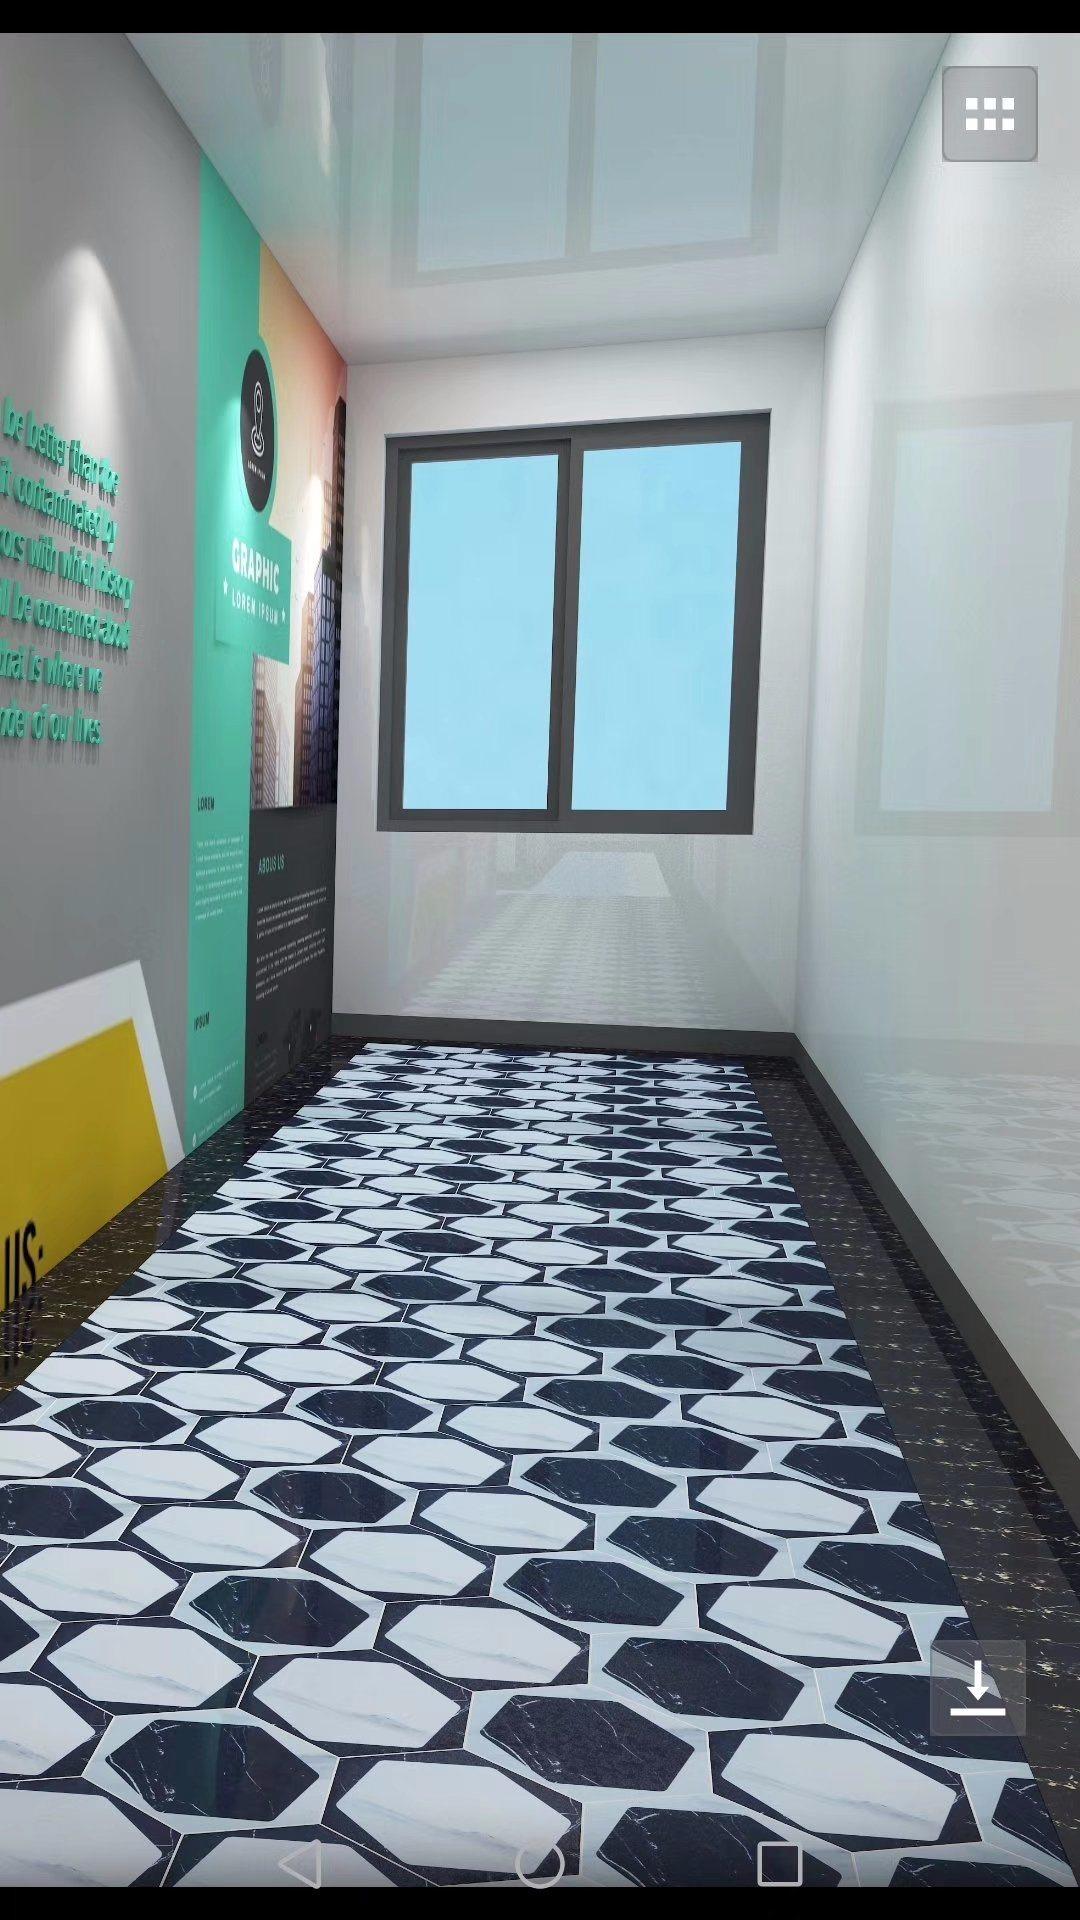 [Hot Item] Mix Color Black White Hexagonal Interior Floor Tiles (9 X 9  X 9 mm)